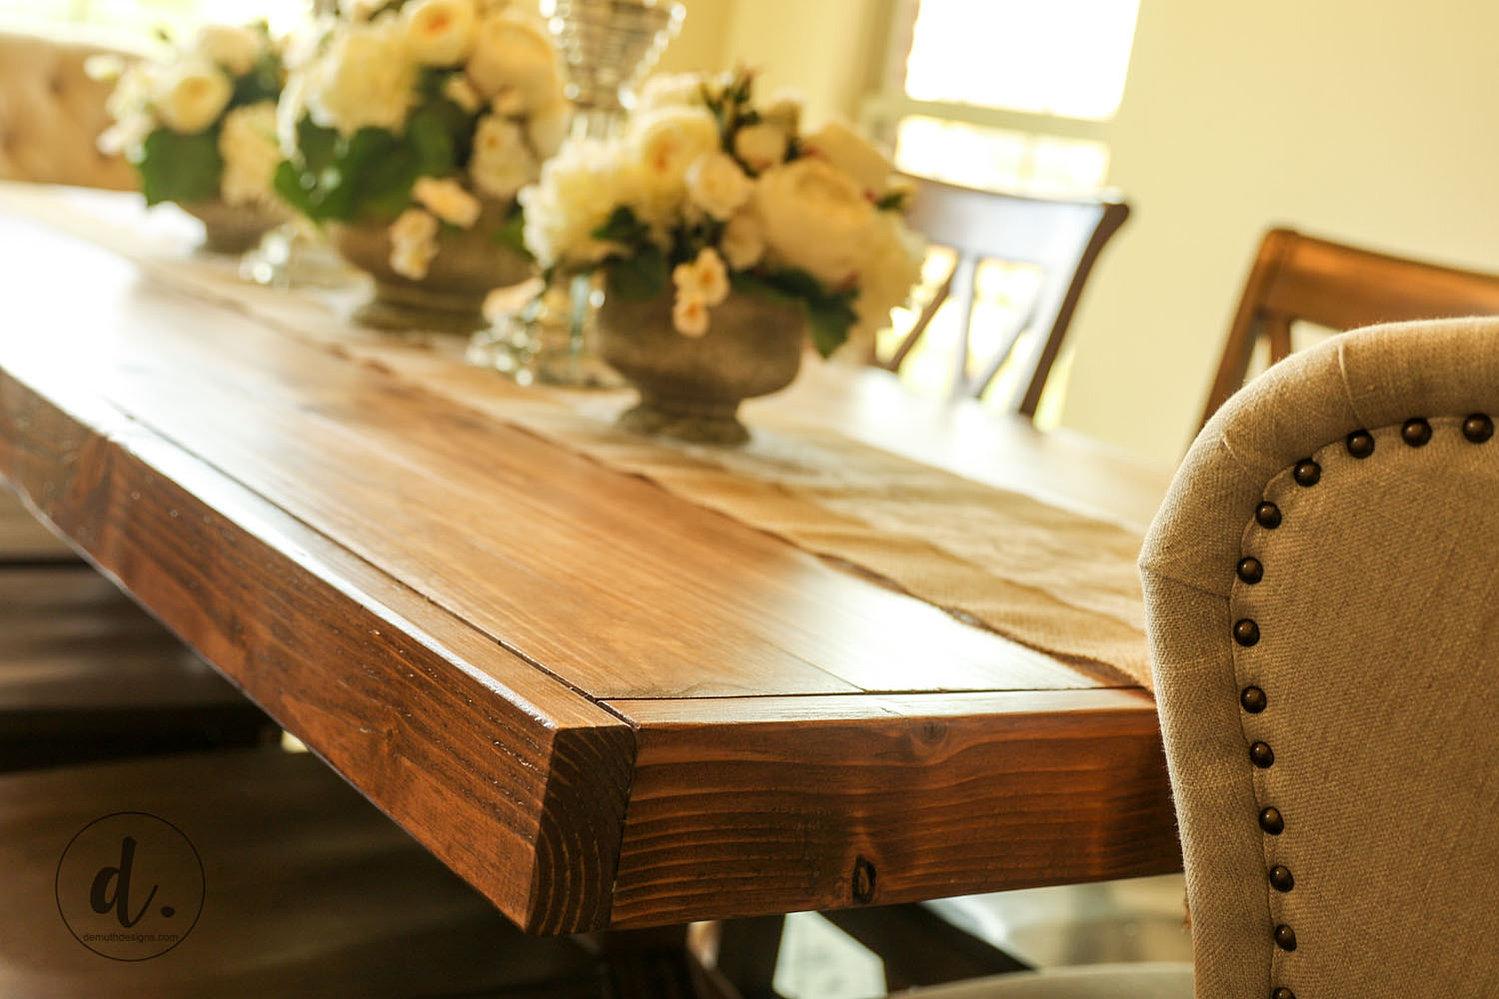 Home Interior Design Portfolio Events Custom Built Pieces About 200 Thoroughbred 5365